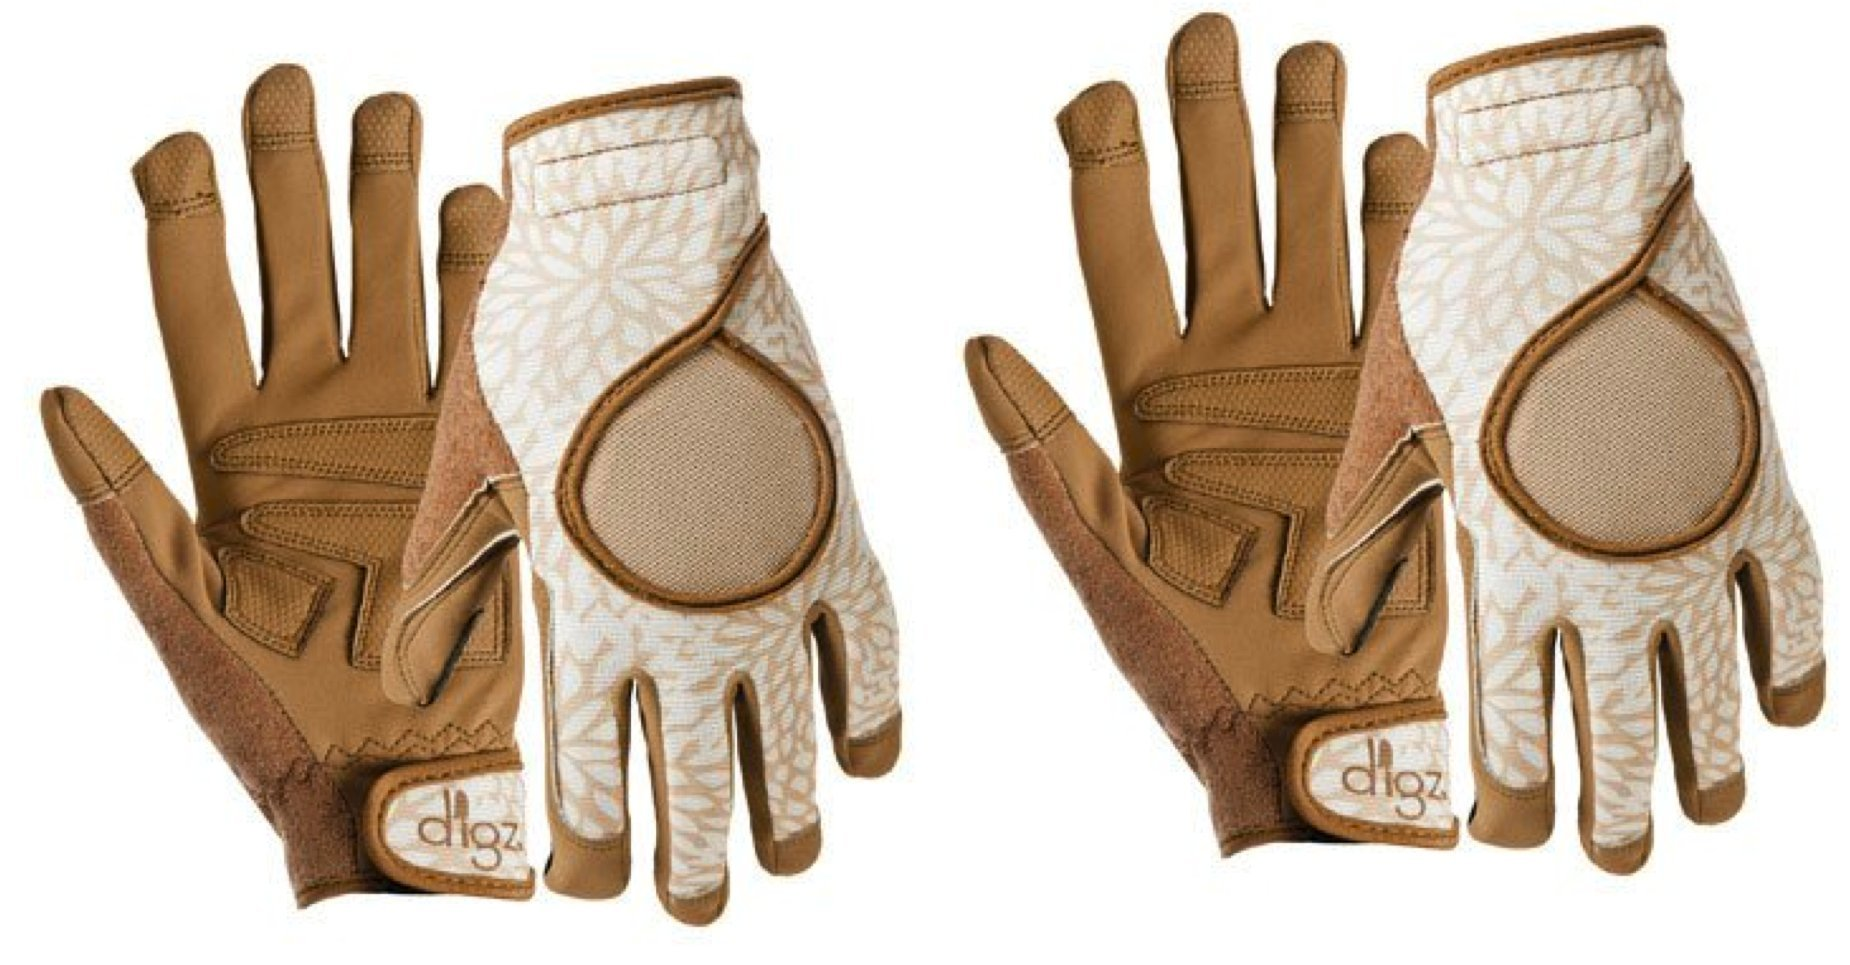 Gardening Gloves for Women, High Performance Signature Brown, 2 Pack Size Medium